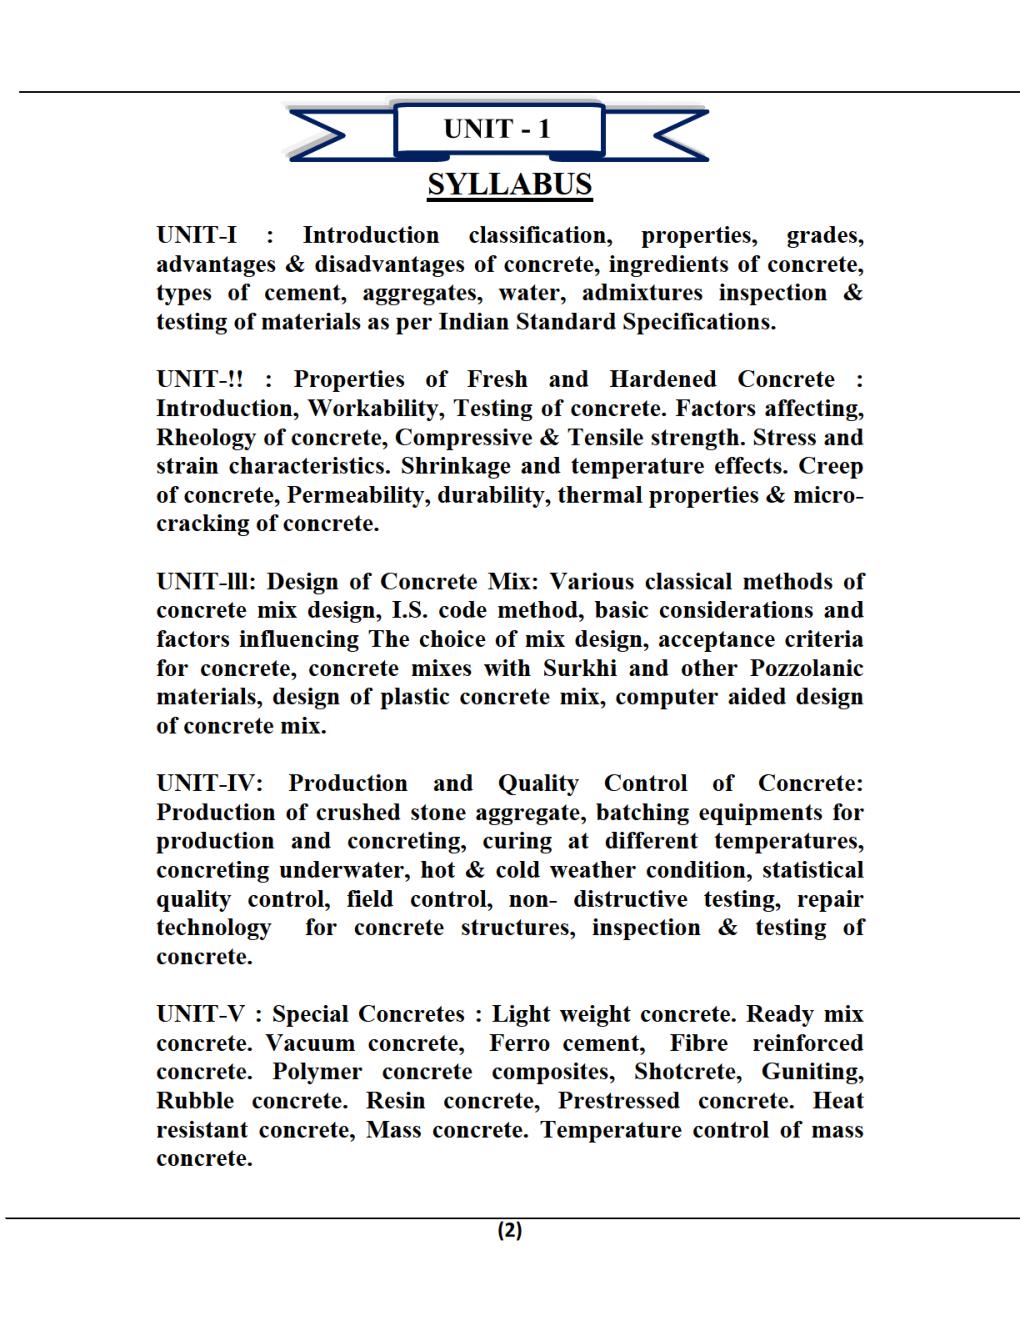 Concrete Technology B.Tech 4th Sem Civil Engineering For JECRC University - Page 2